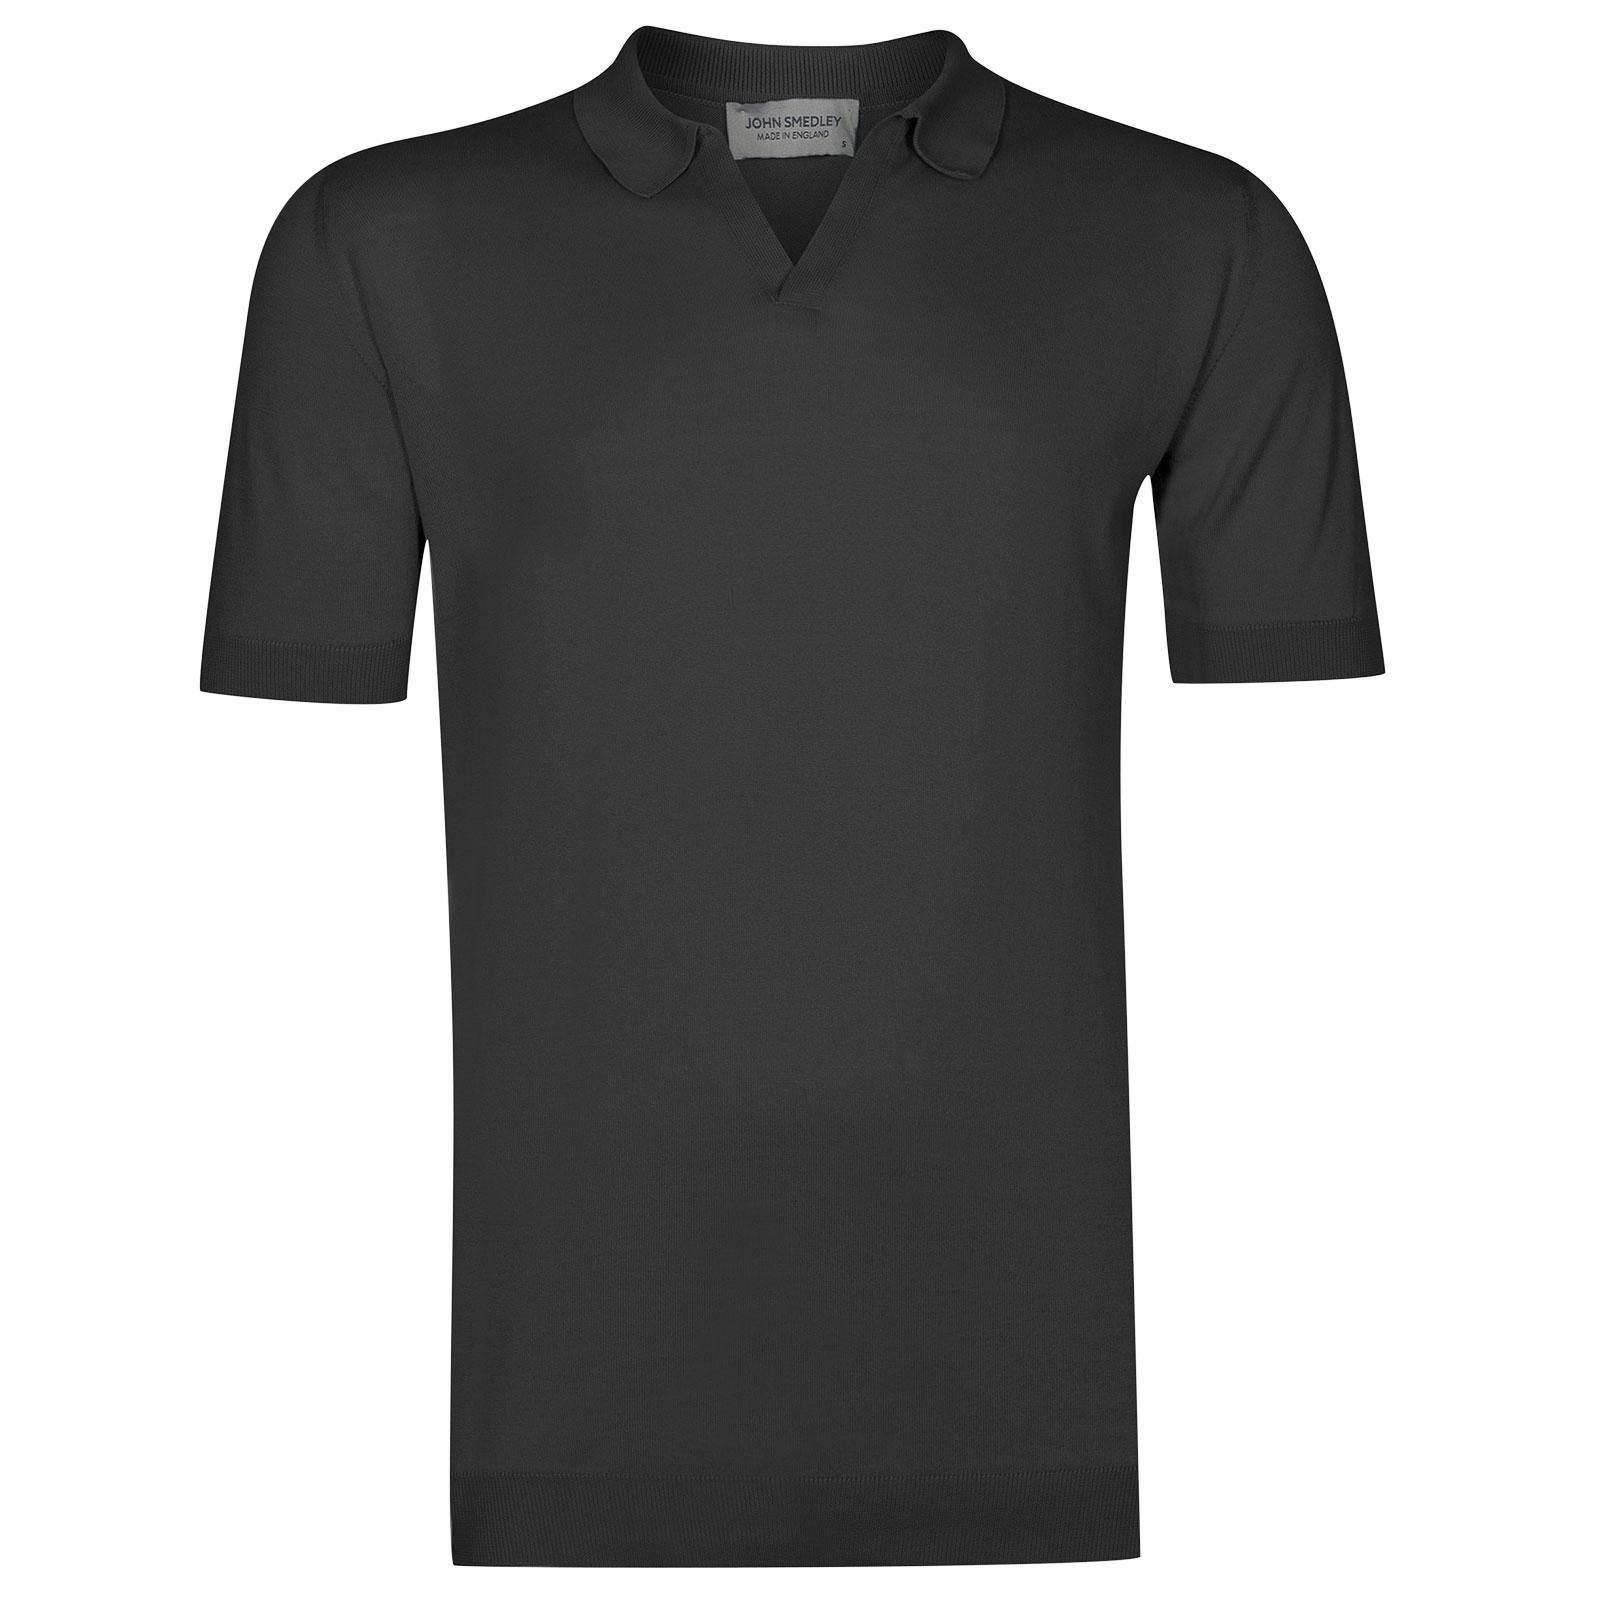 John Smedley Noah in Flannel Grey Shirt-LGE